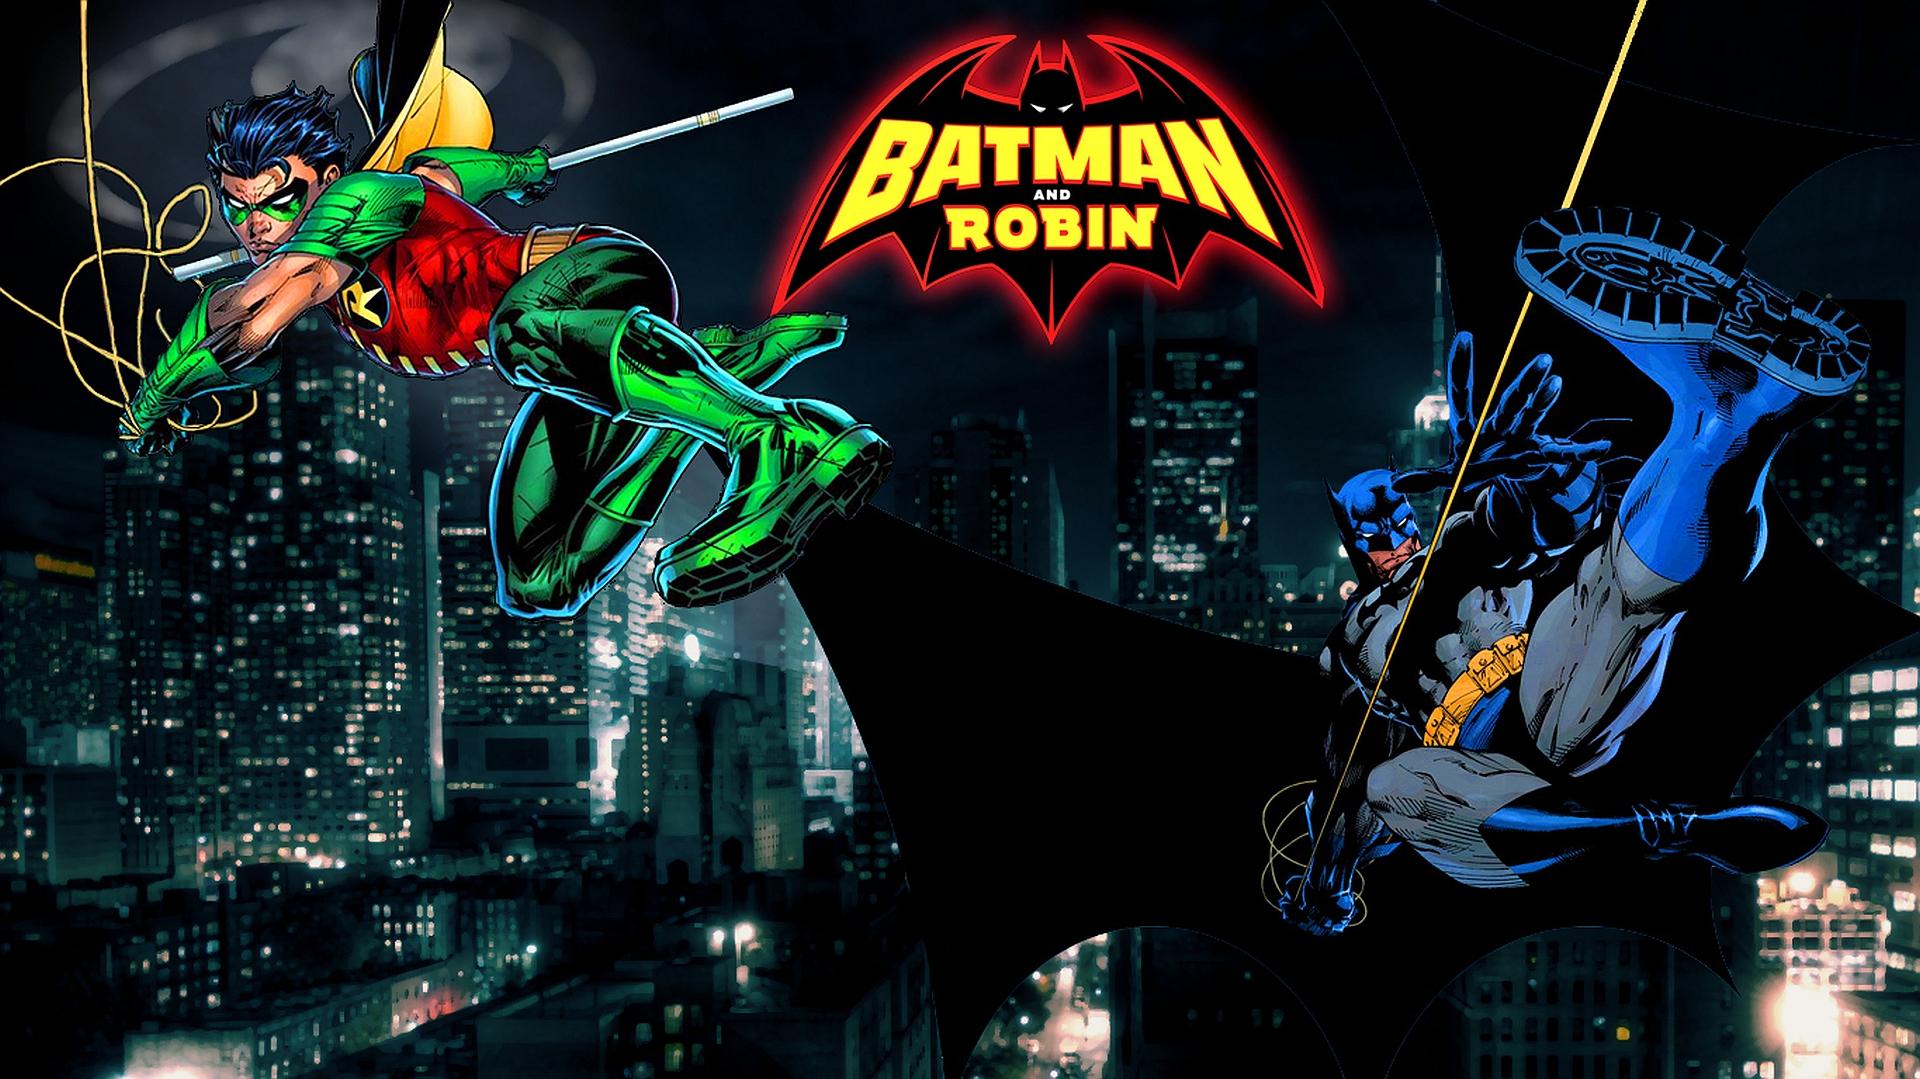 batman robin wallpaper 1433x897 - photo #17